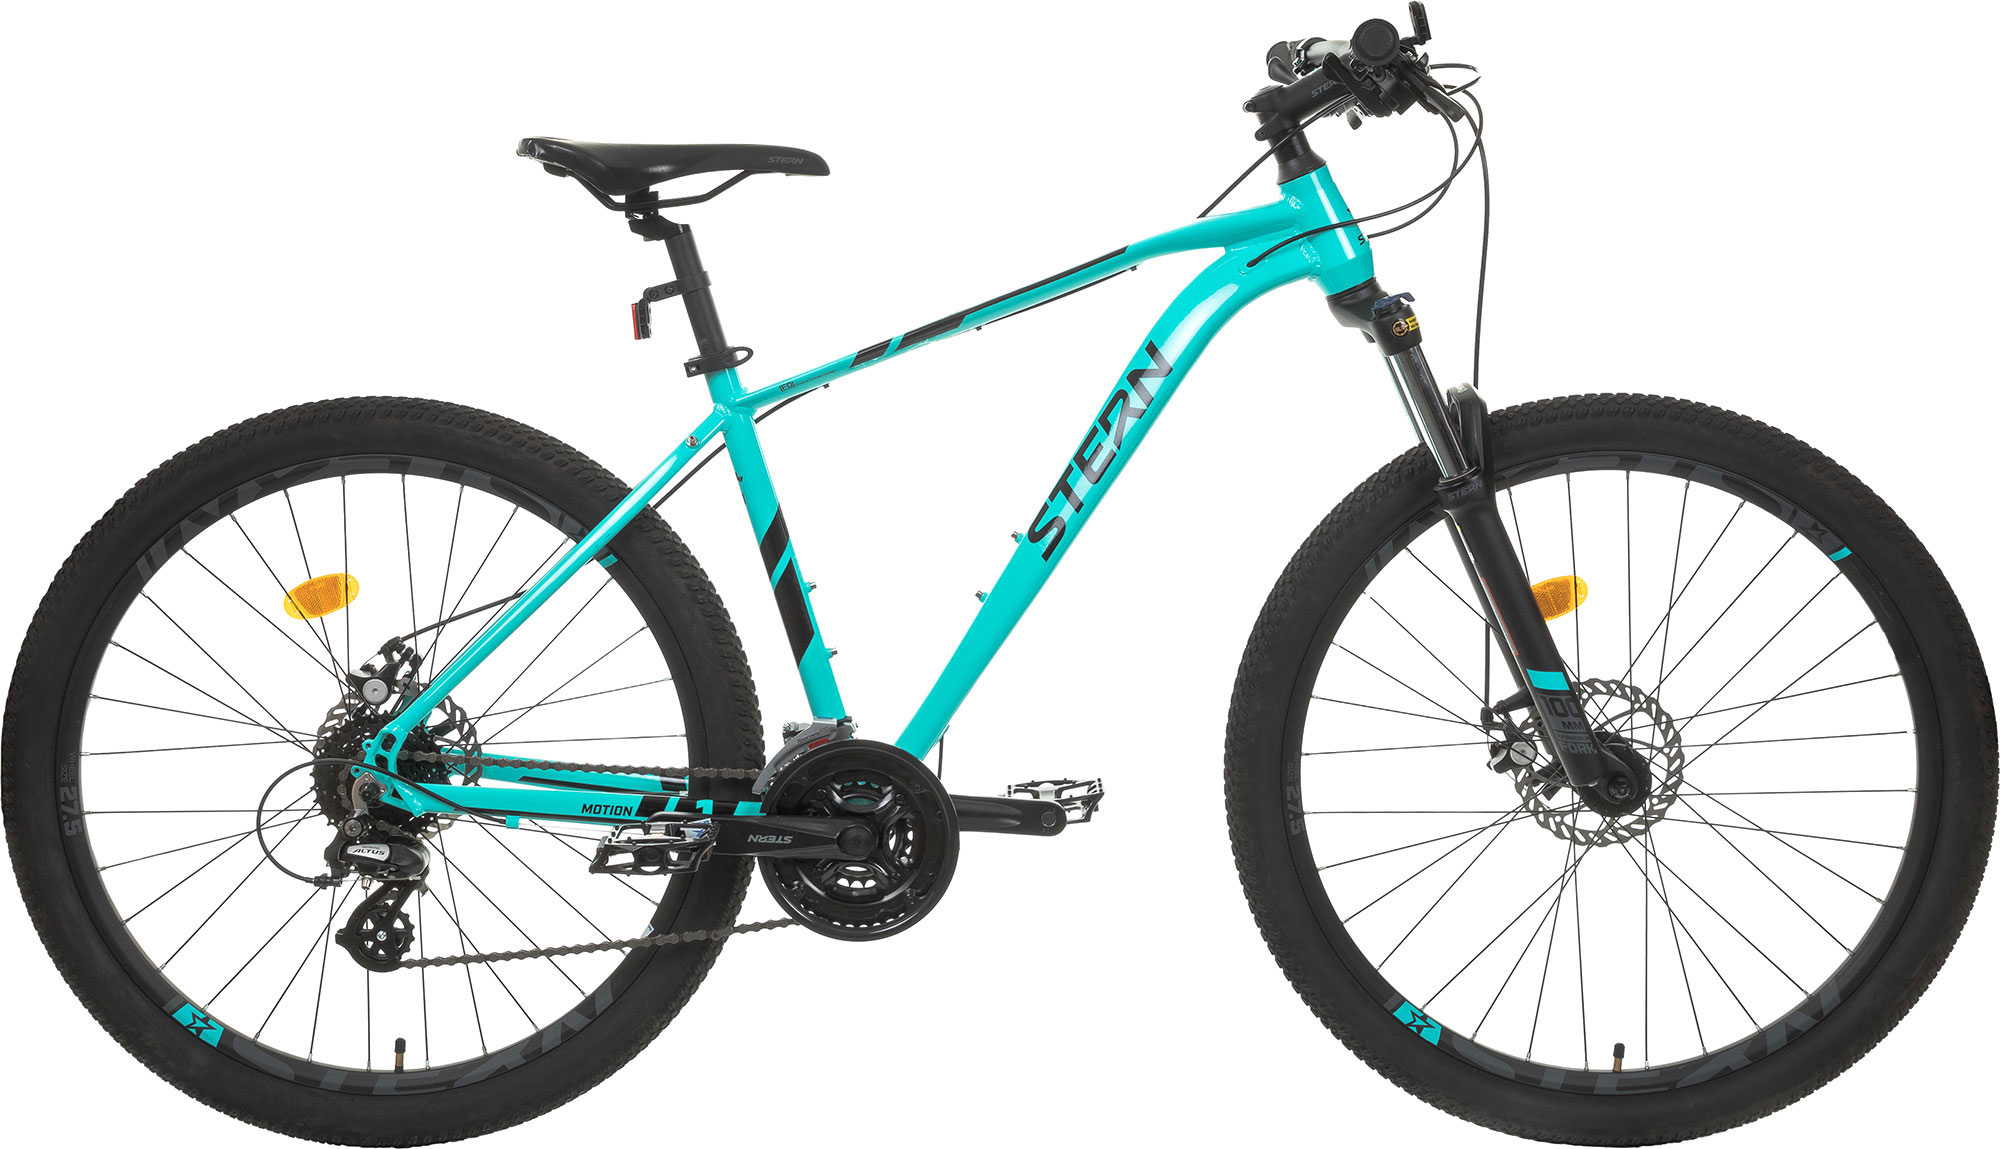 Stern Велосипед горный Stern Motion 1.0 alt 27.5 stern stern motion 4 0 27 5 2018